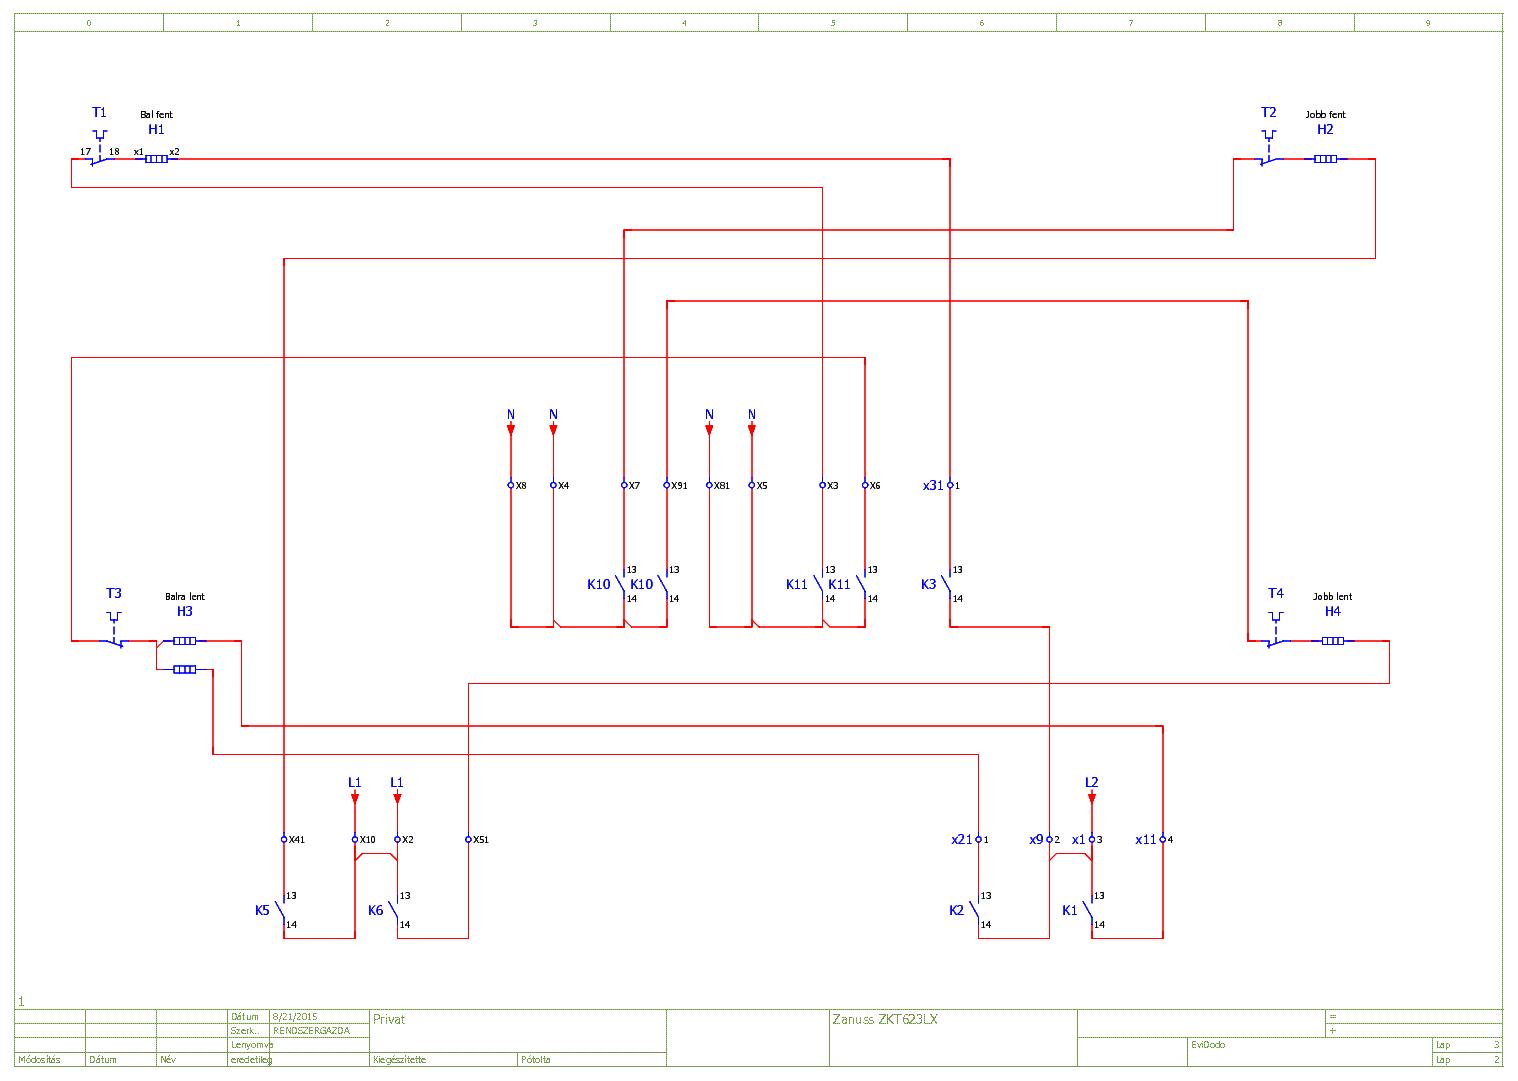 ZANUSSI ZKT623LX FOZOLAP service manual (1st page)